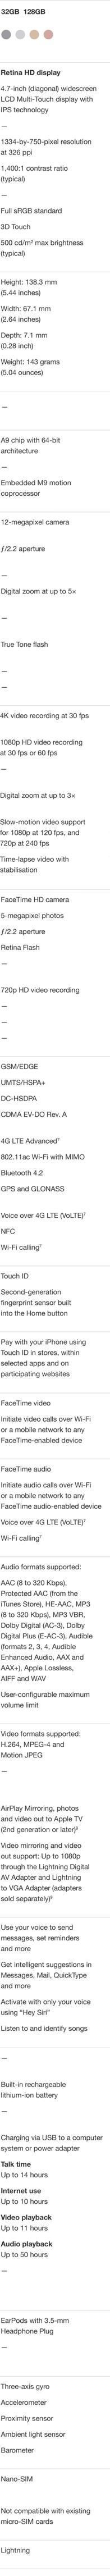 iPhone 6 Plus Specifications